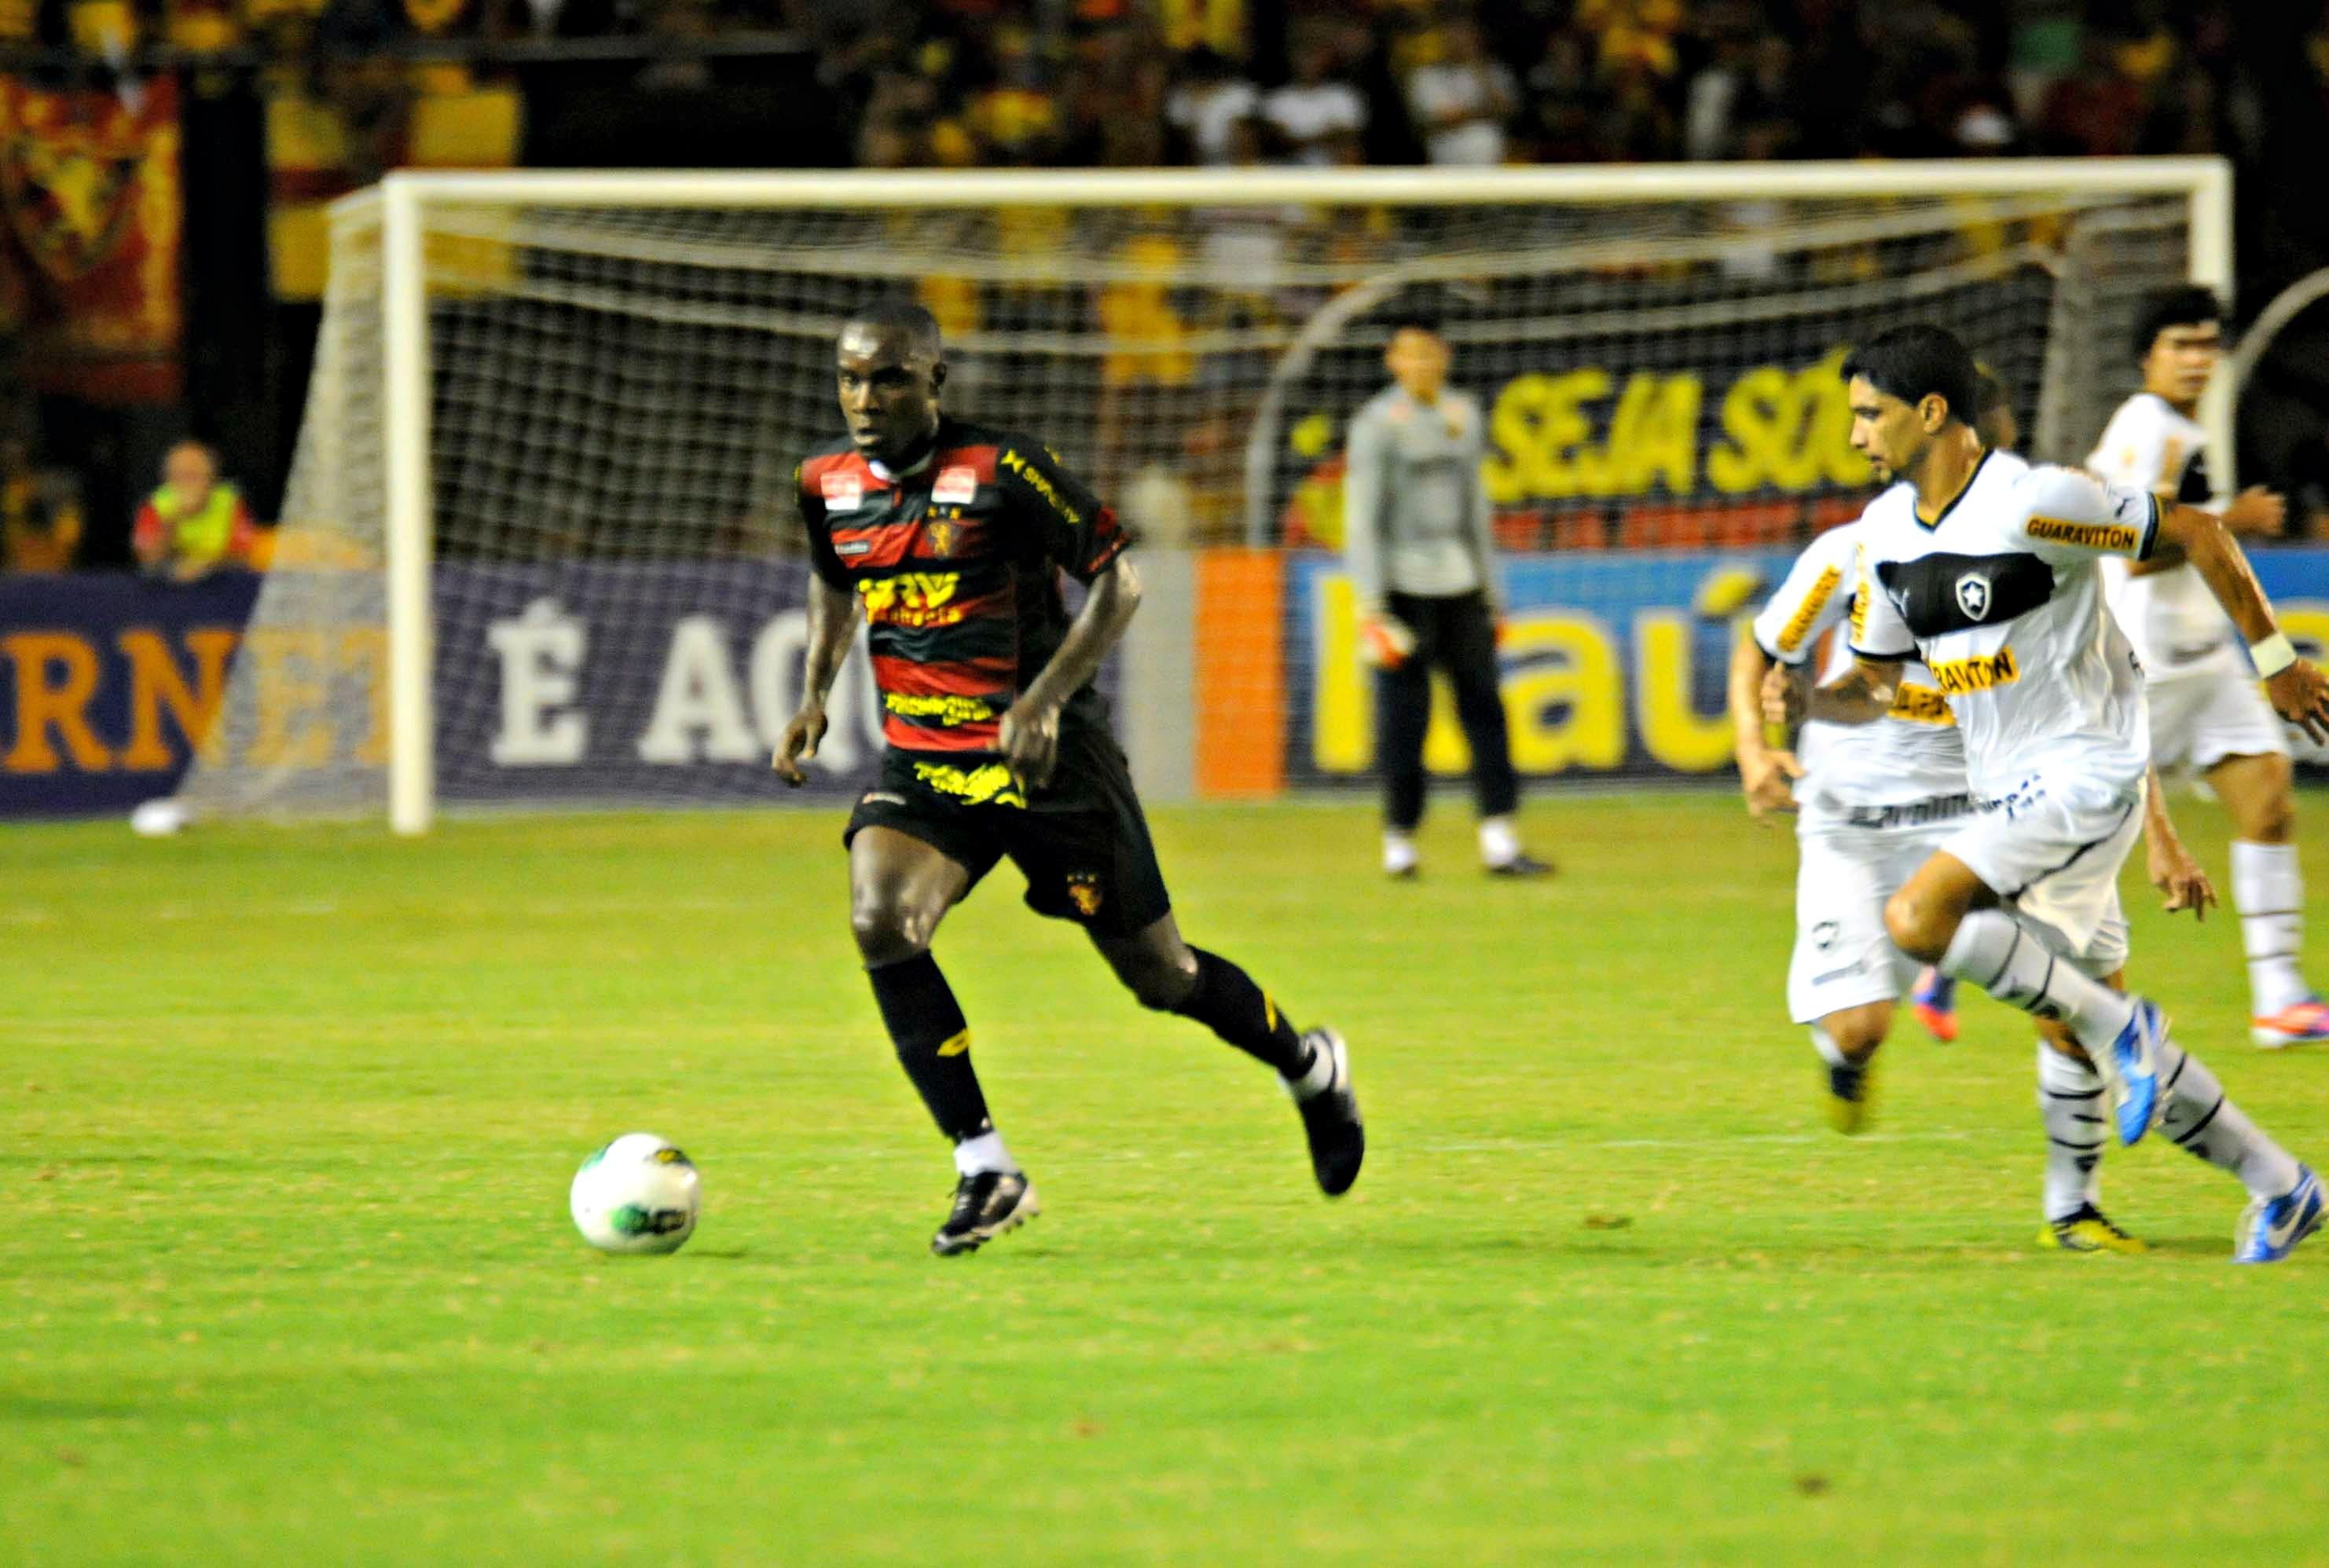 Sport X Botafogo Campeonato Brasileiro 2012 Sportv